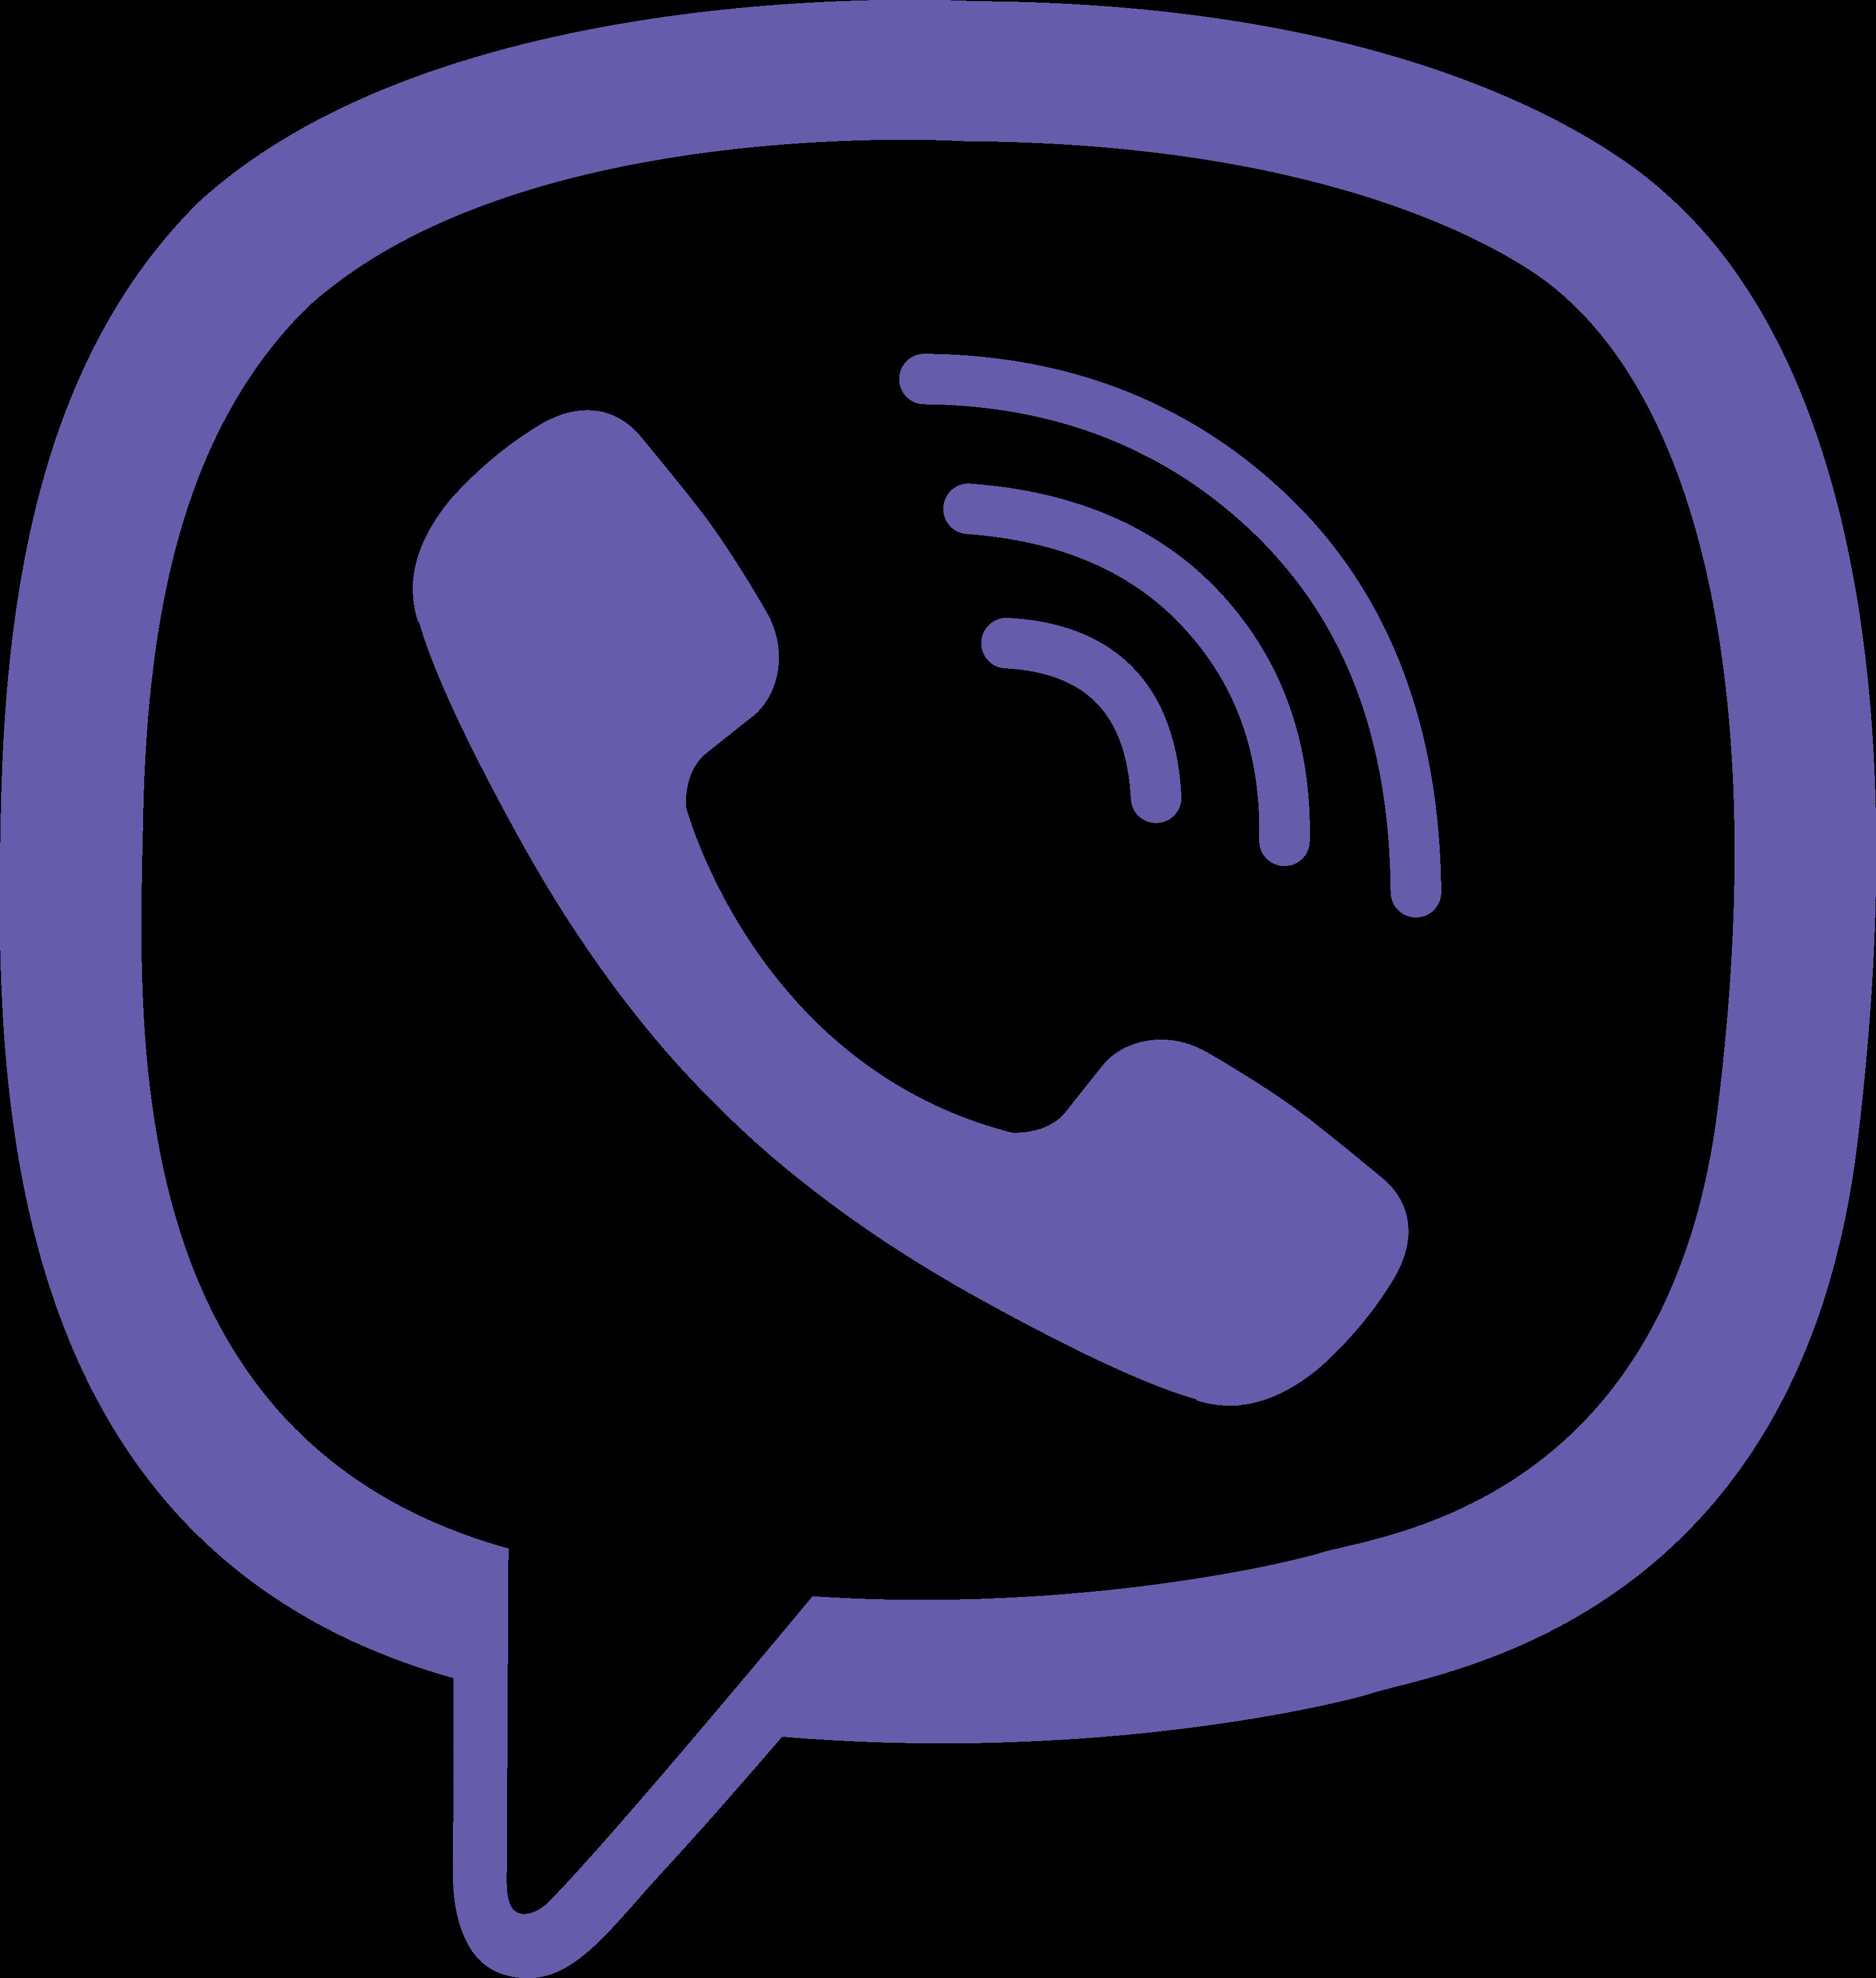 viber logo icon - Rakuten Viber Logo - Icon